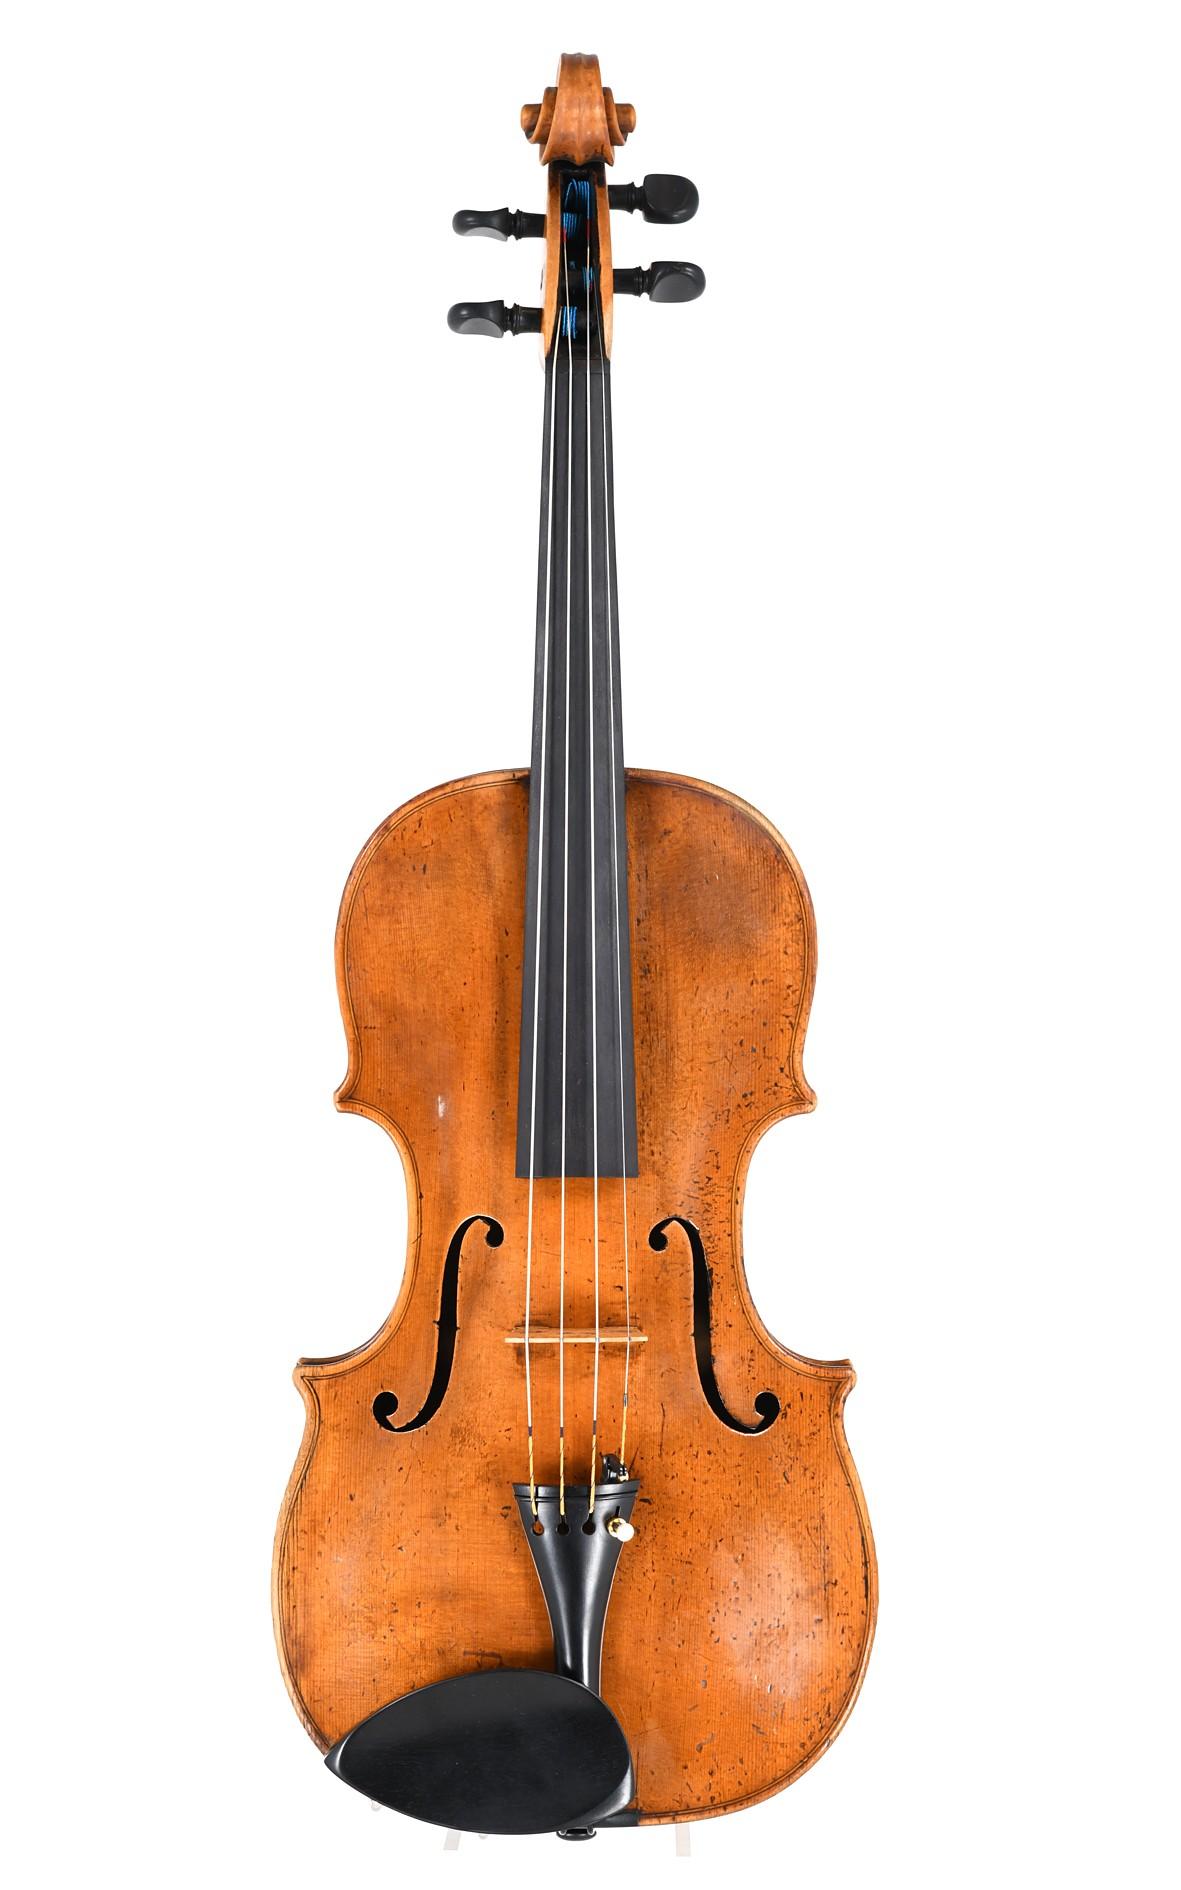 David Hopf Sr. violin